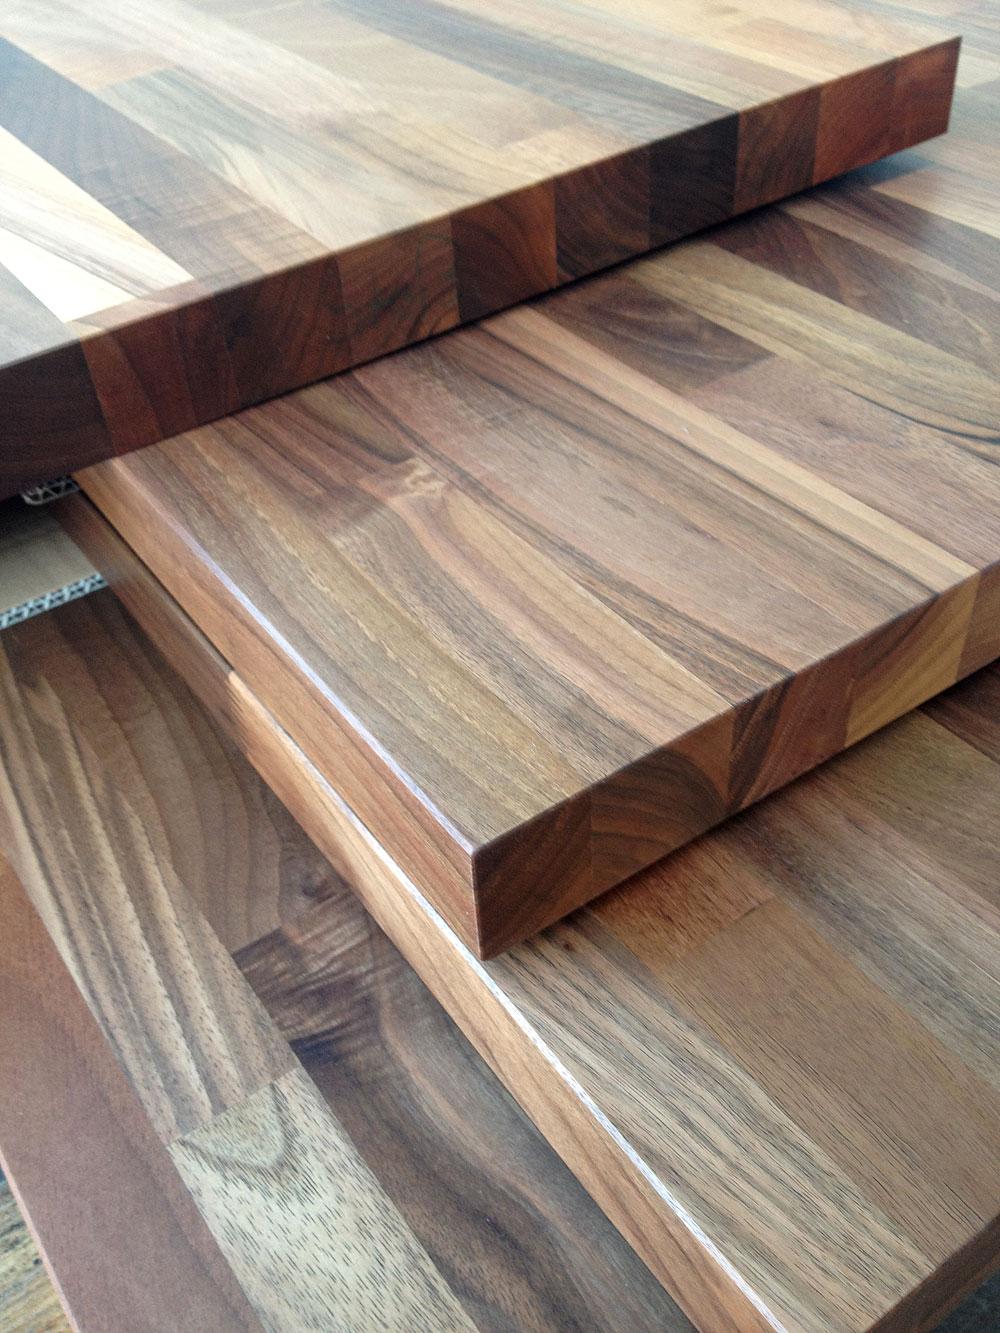 arbeitsplatte k chenarbeitsplatte massivholz europ ischer nussbaum kgz fsc 40 3050 900. Black Bedroom Furniture Sets. Home Design Ideas